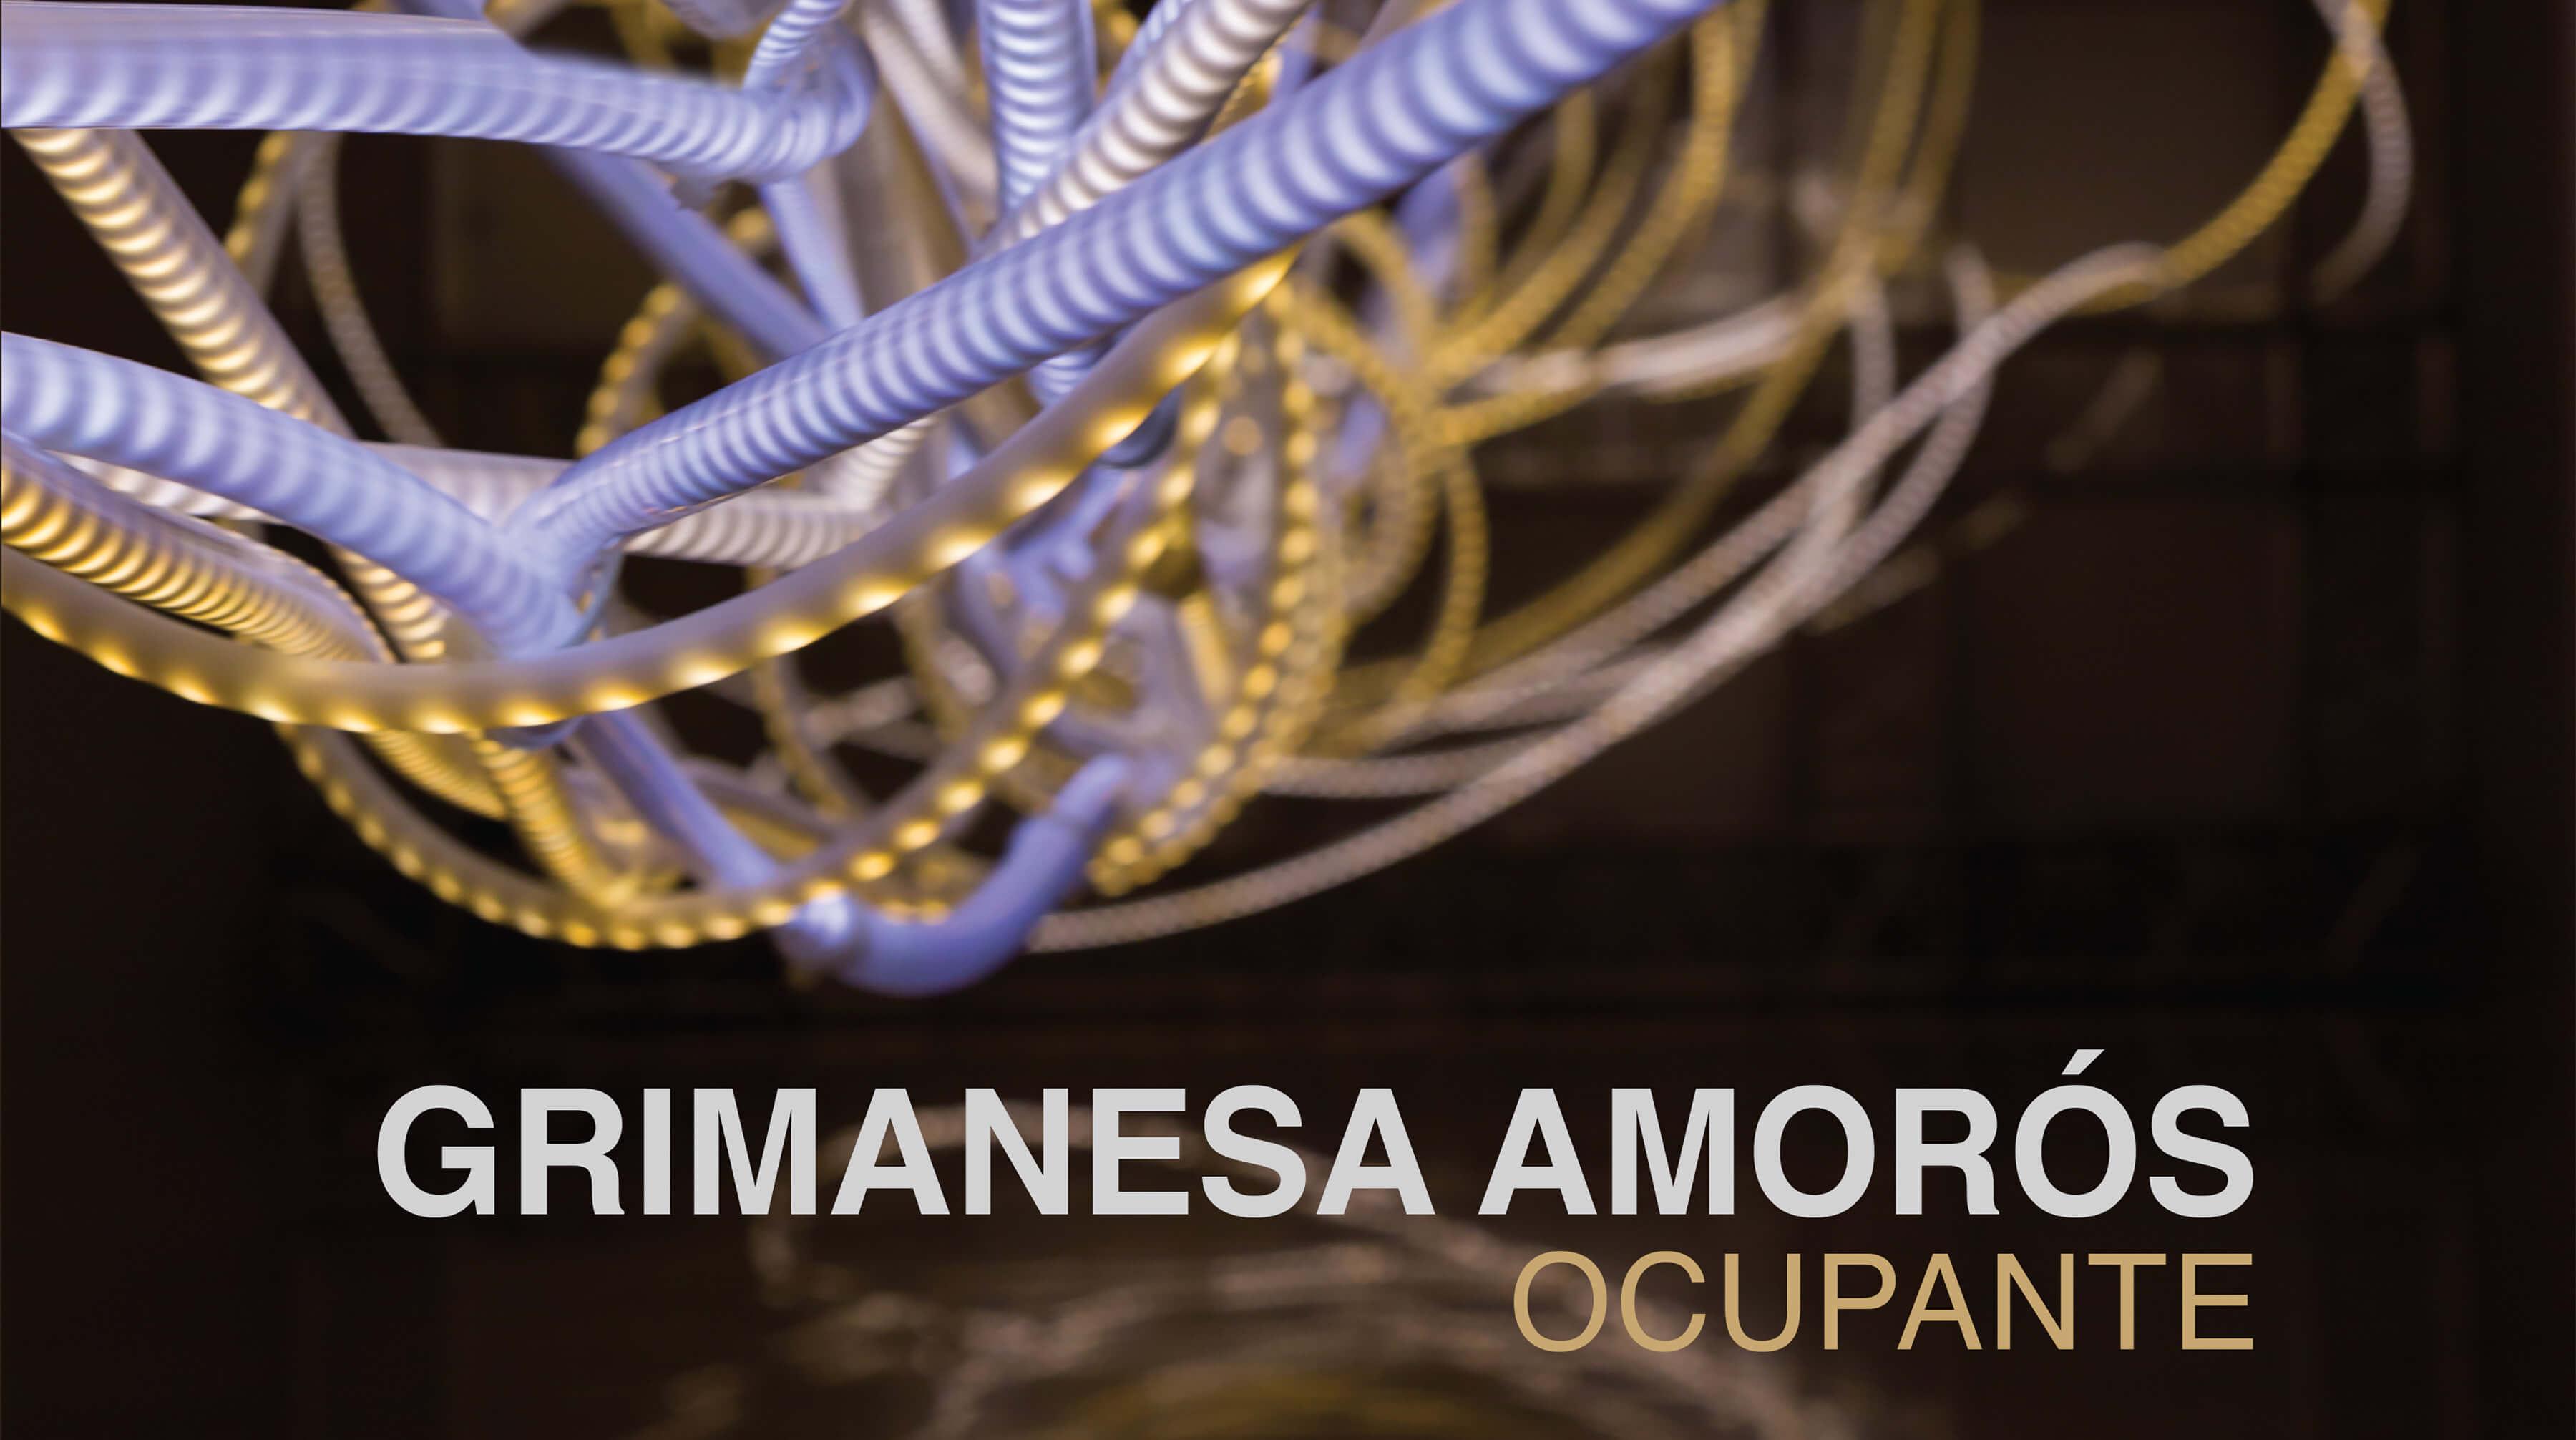 grimanesa amoros ocupante hirmer 3D render catalogue front cover